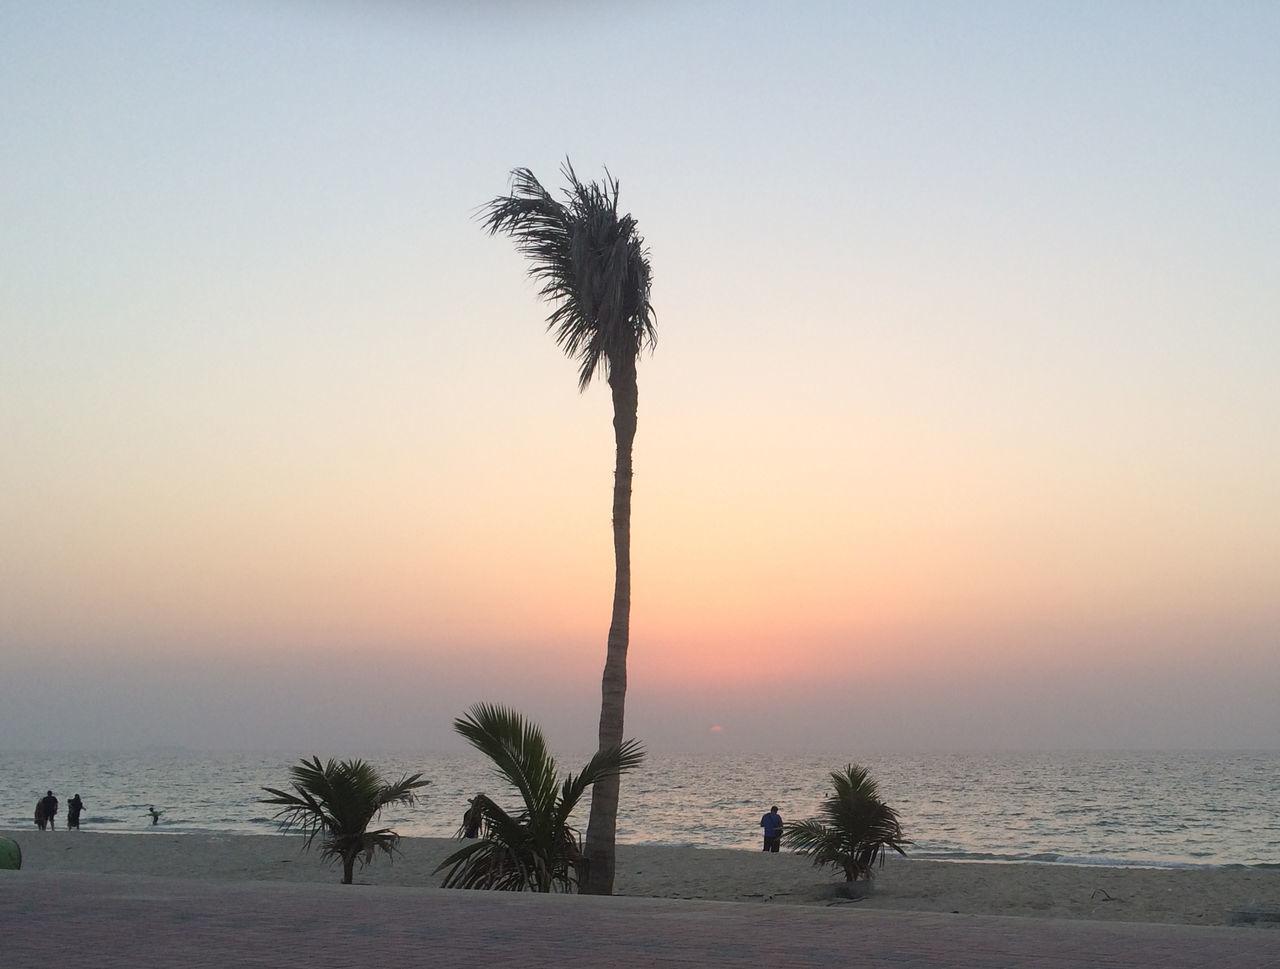 Beach Nature No People Outdoors Palm Tree Sky Sunset Tree